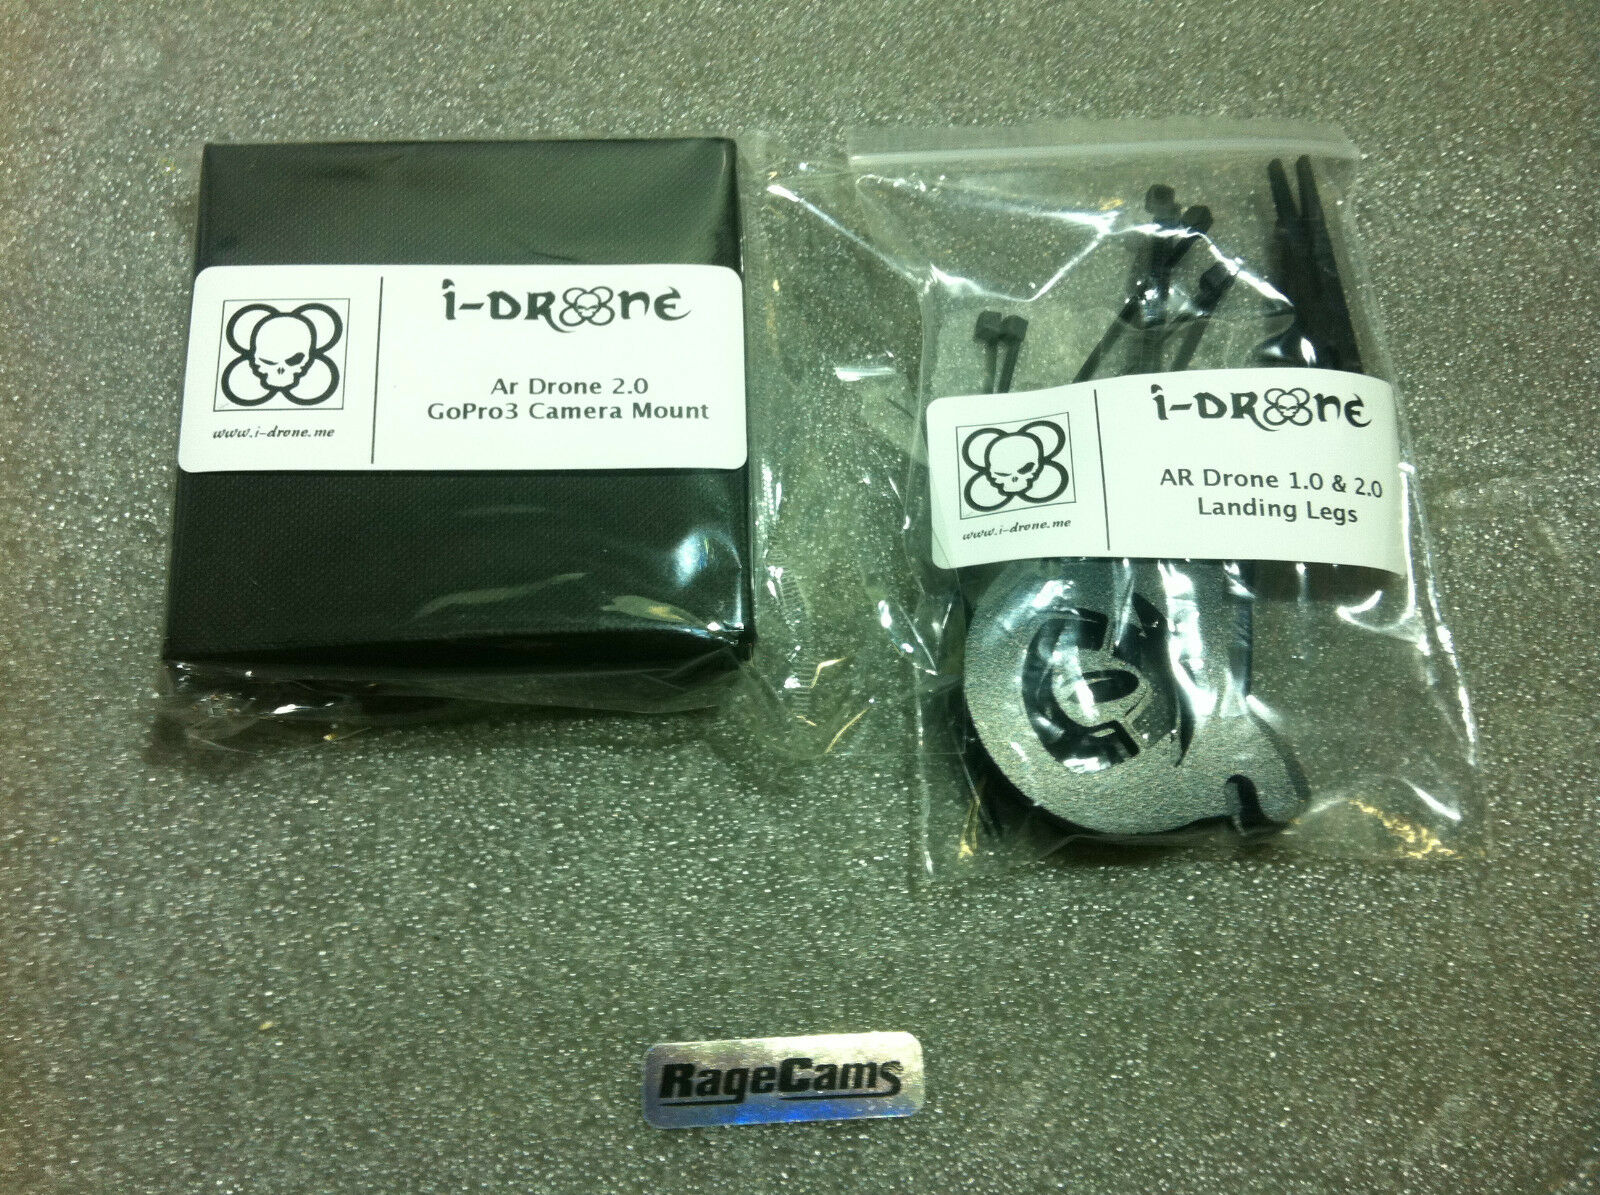 I-drone Ar Drone 2.0 Gopro 3 Stabilizer Custom Mount For ...